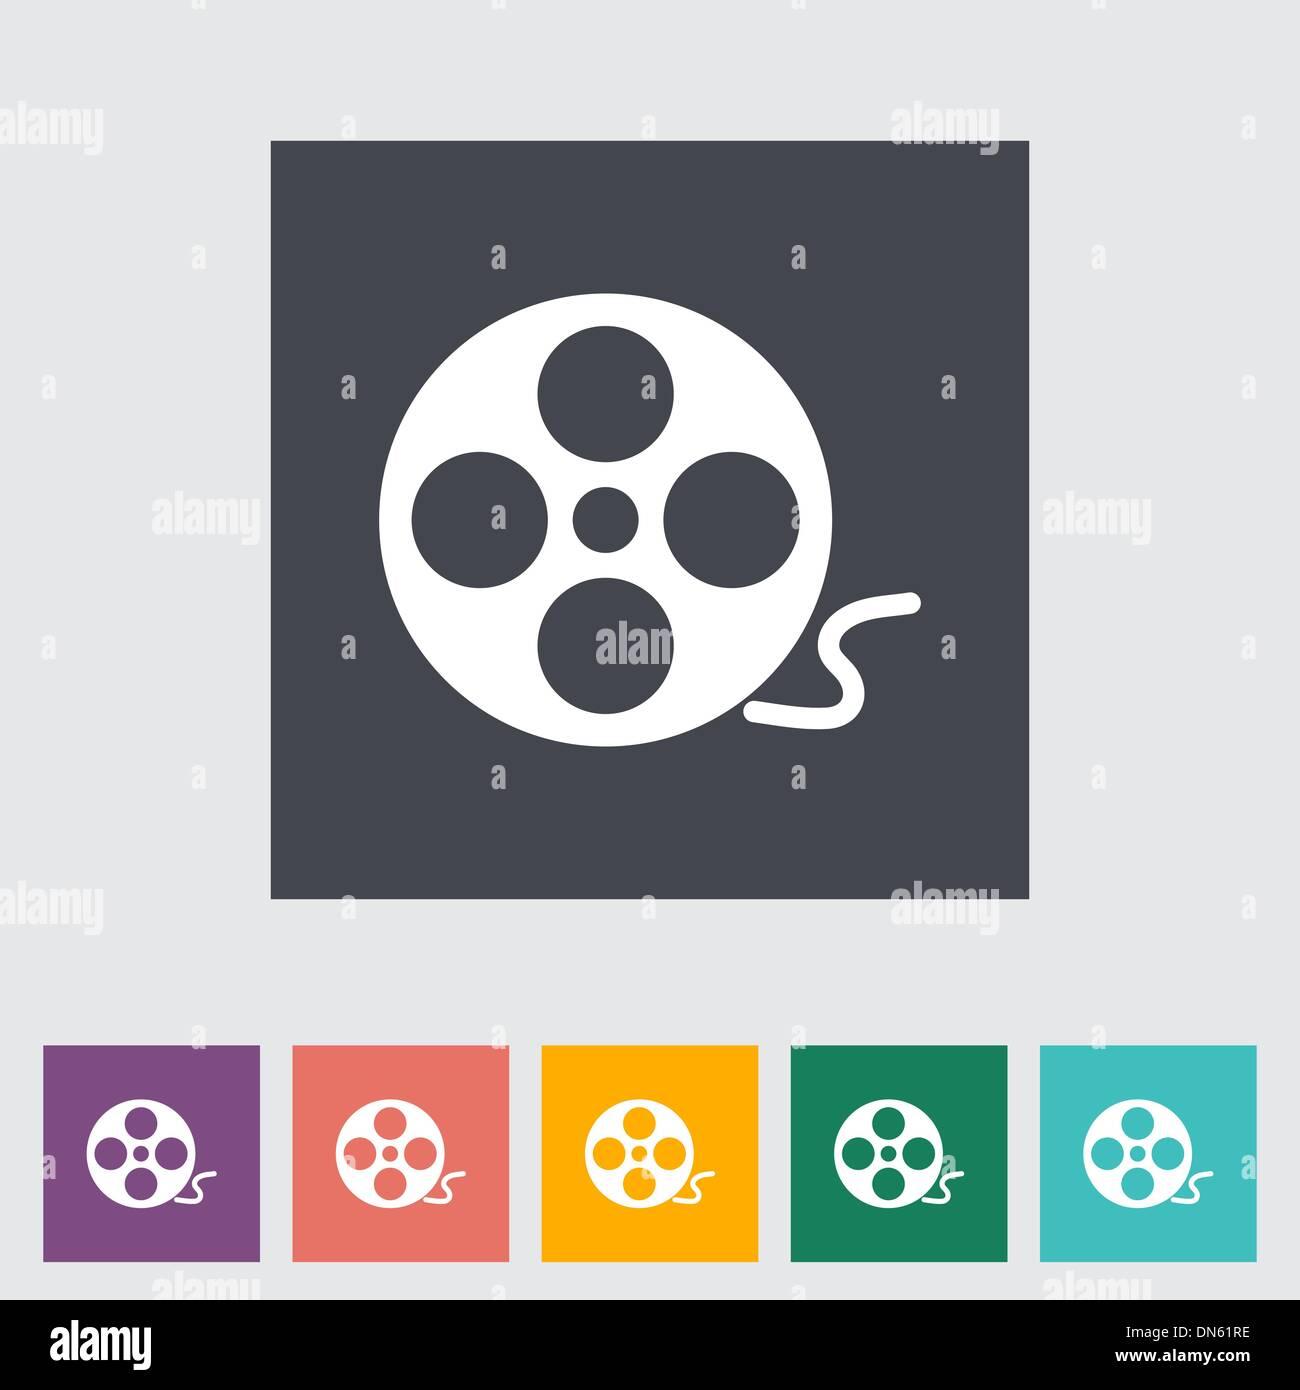 Icon reel of film - Stock Image